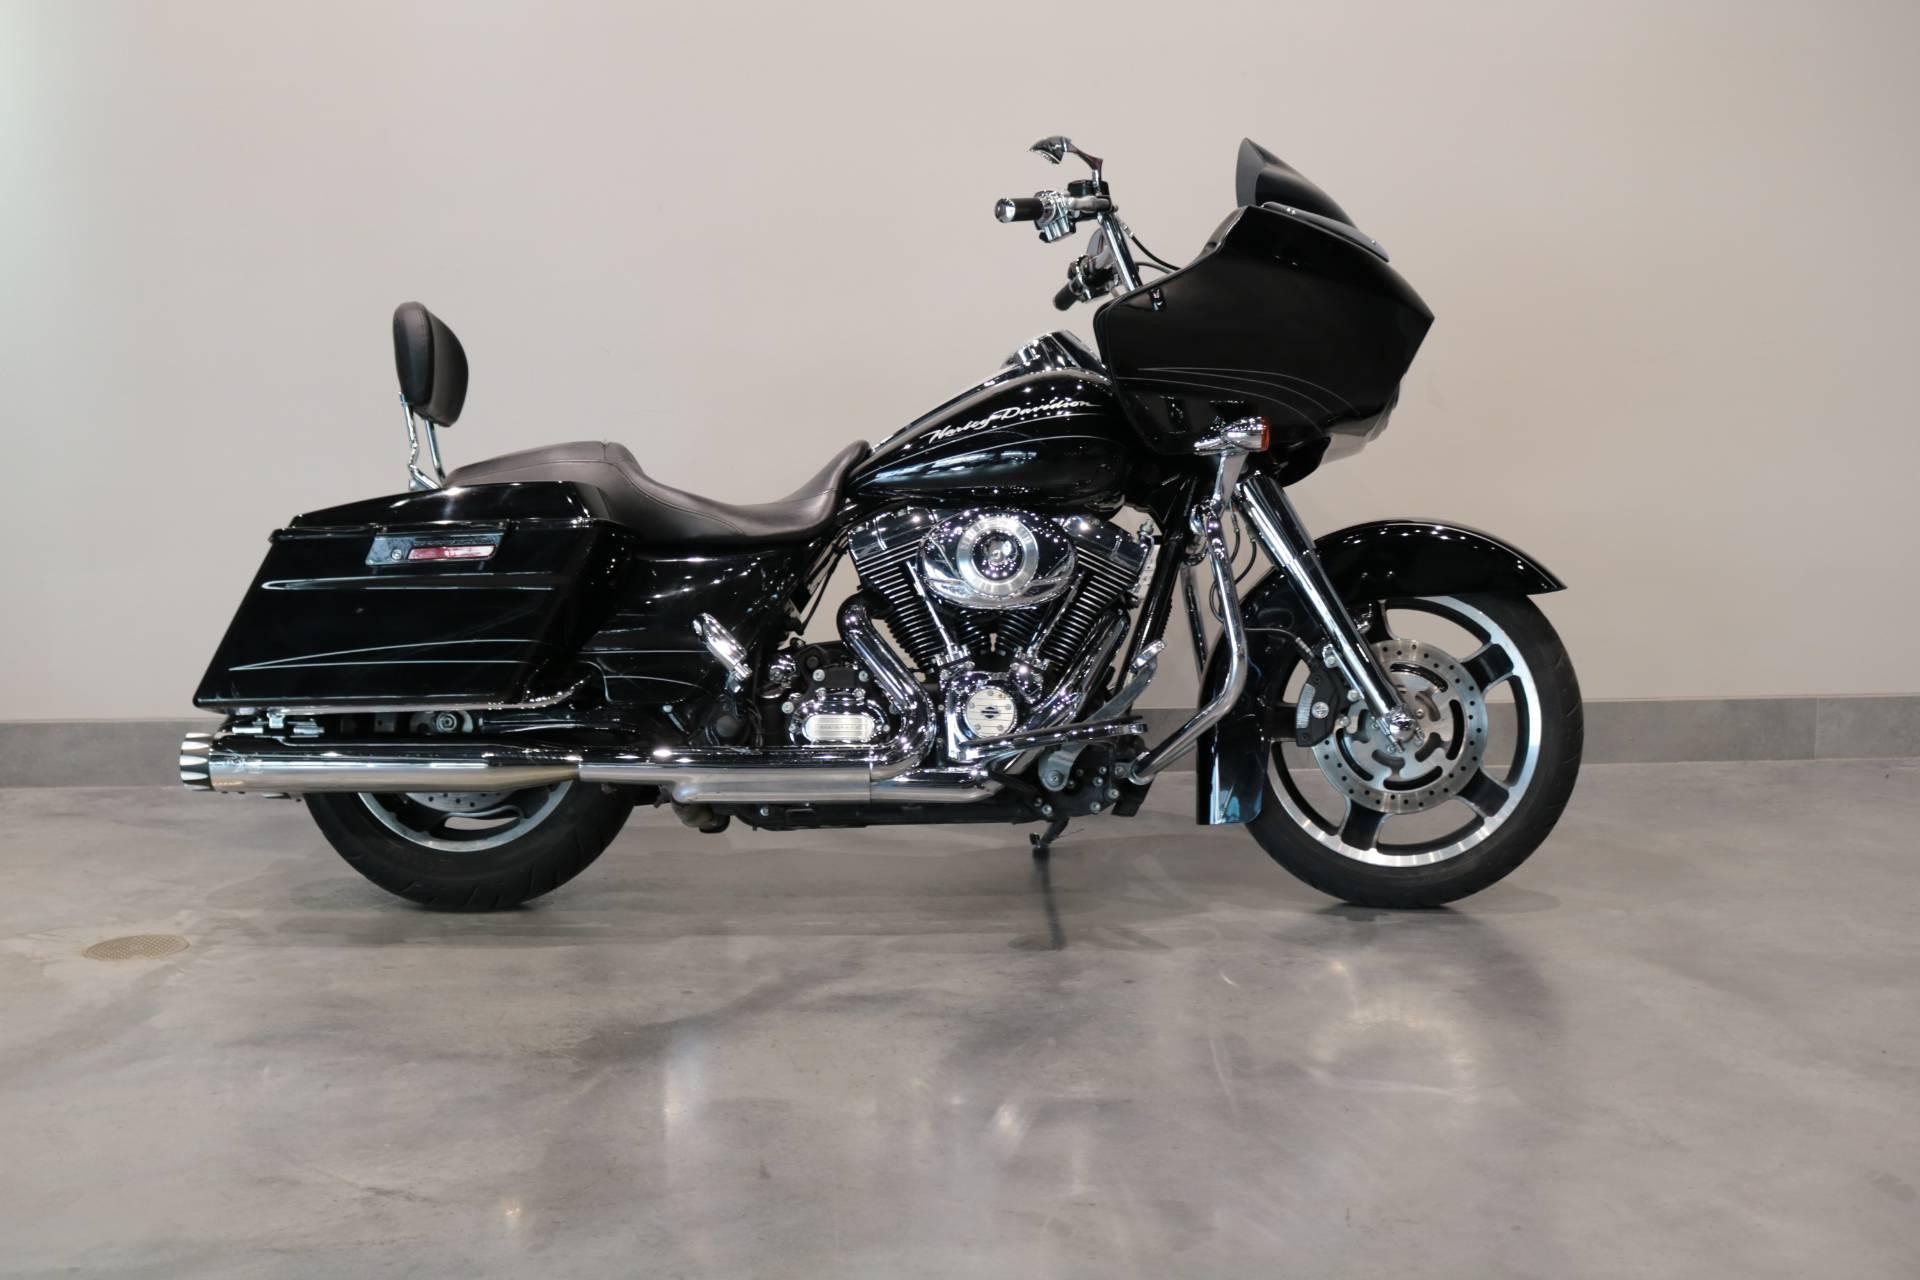 Used 2013 Harley Davidson Road Glide Custom Motorcycles In Saint Paul Mn Stock Number Poh608597 Dealer Url